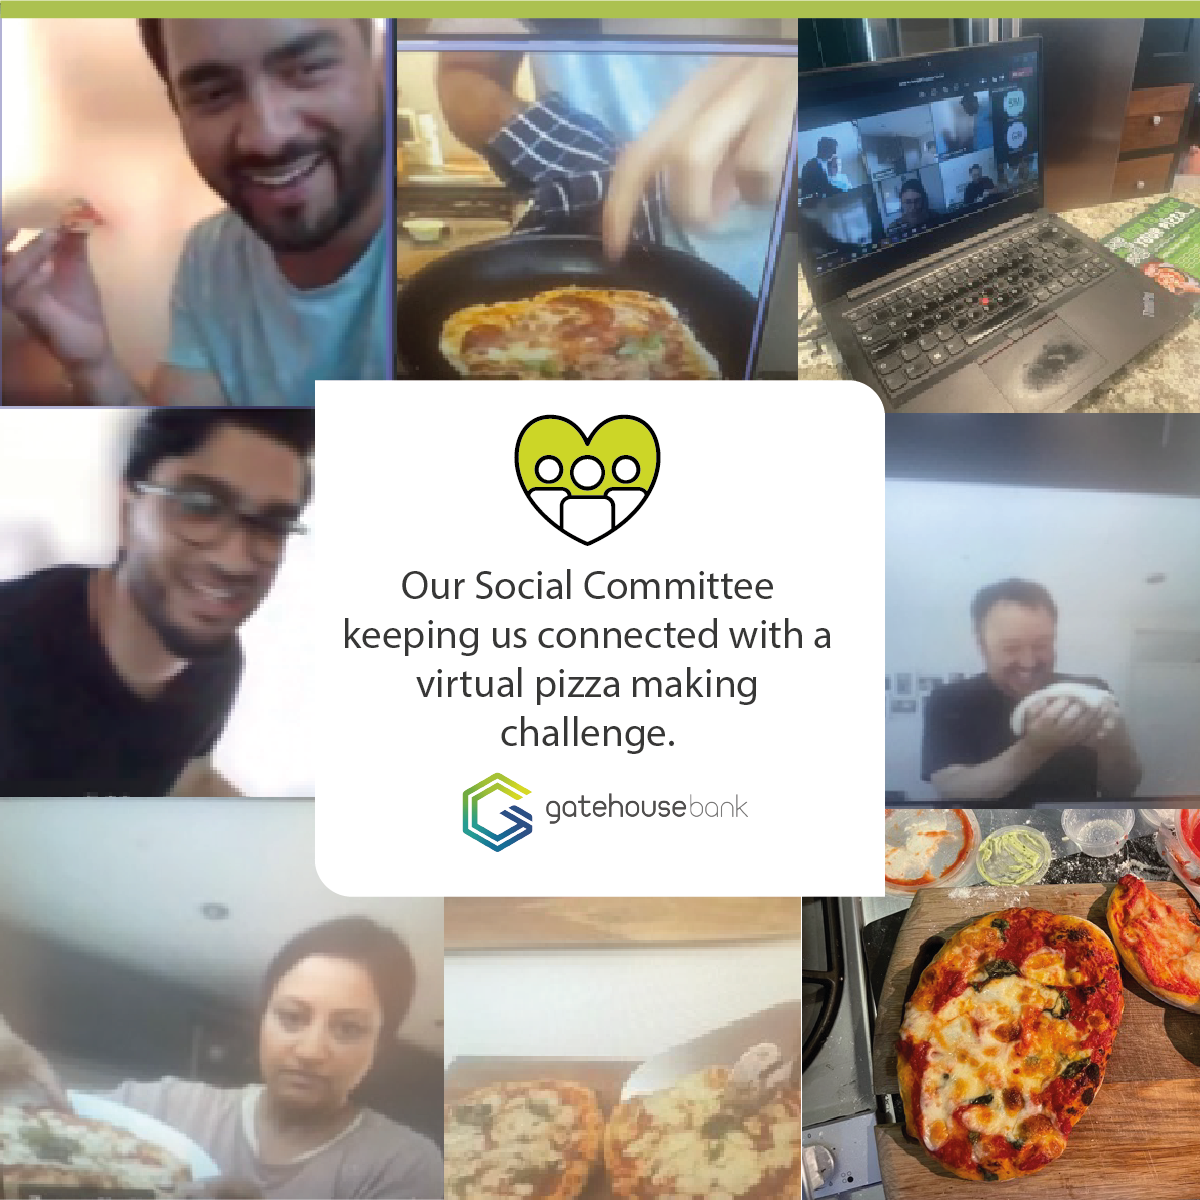 Pizza making challenge